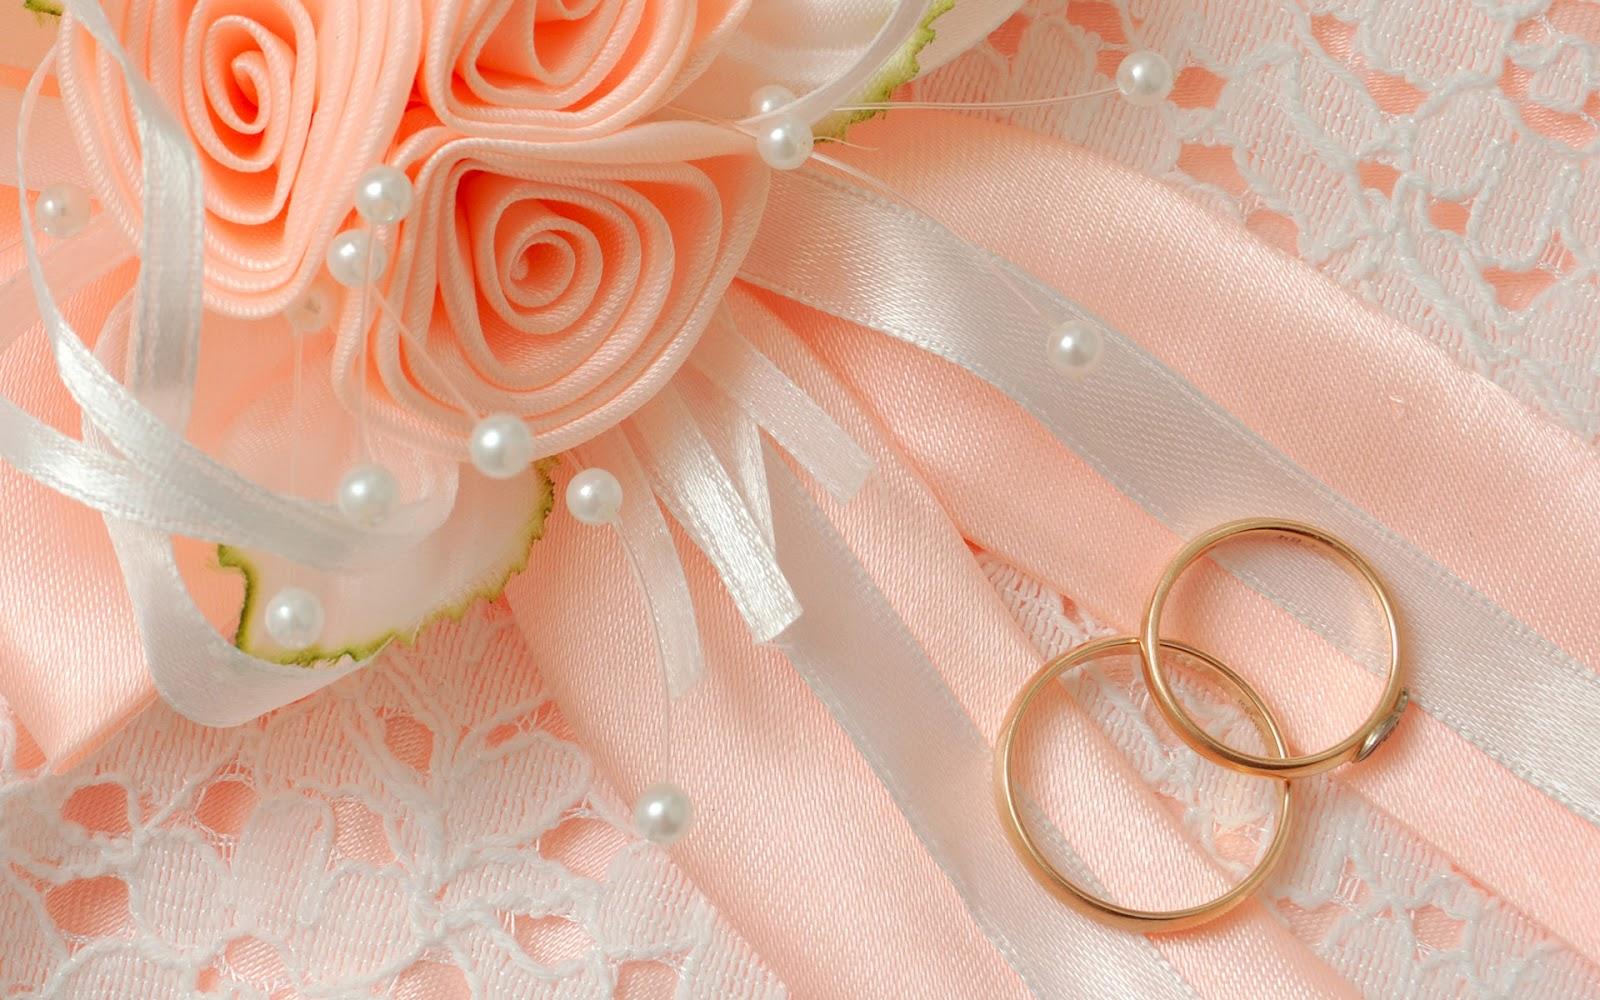 بالصور خلفيات زواج , صور خلفيات مميزه لا مثيل لها لاجمل عروسين 3626 12